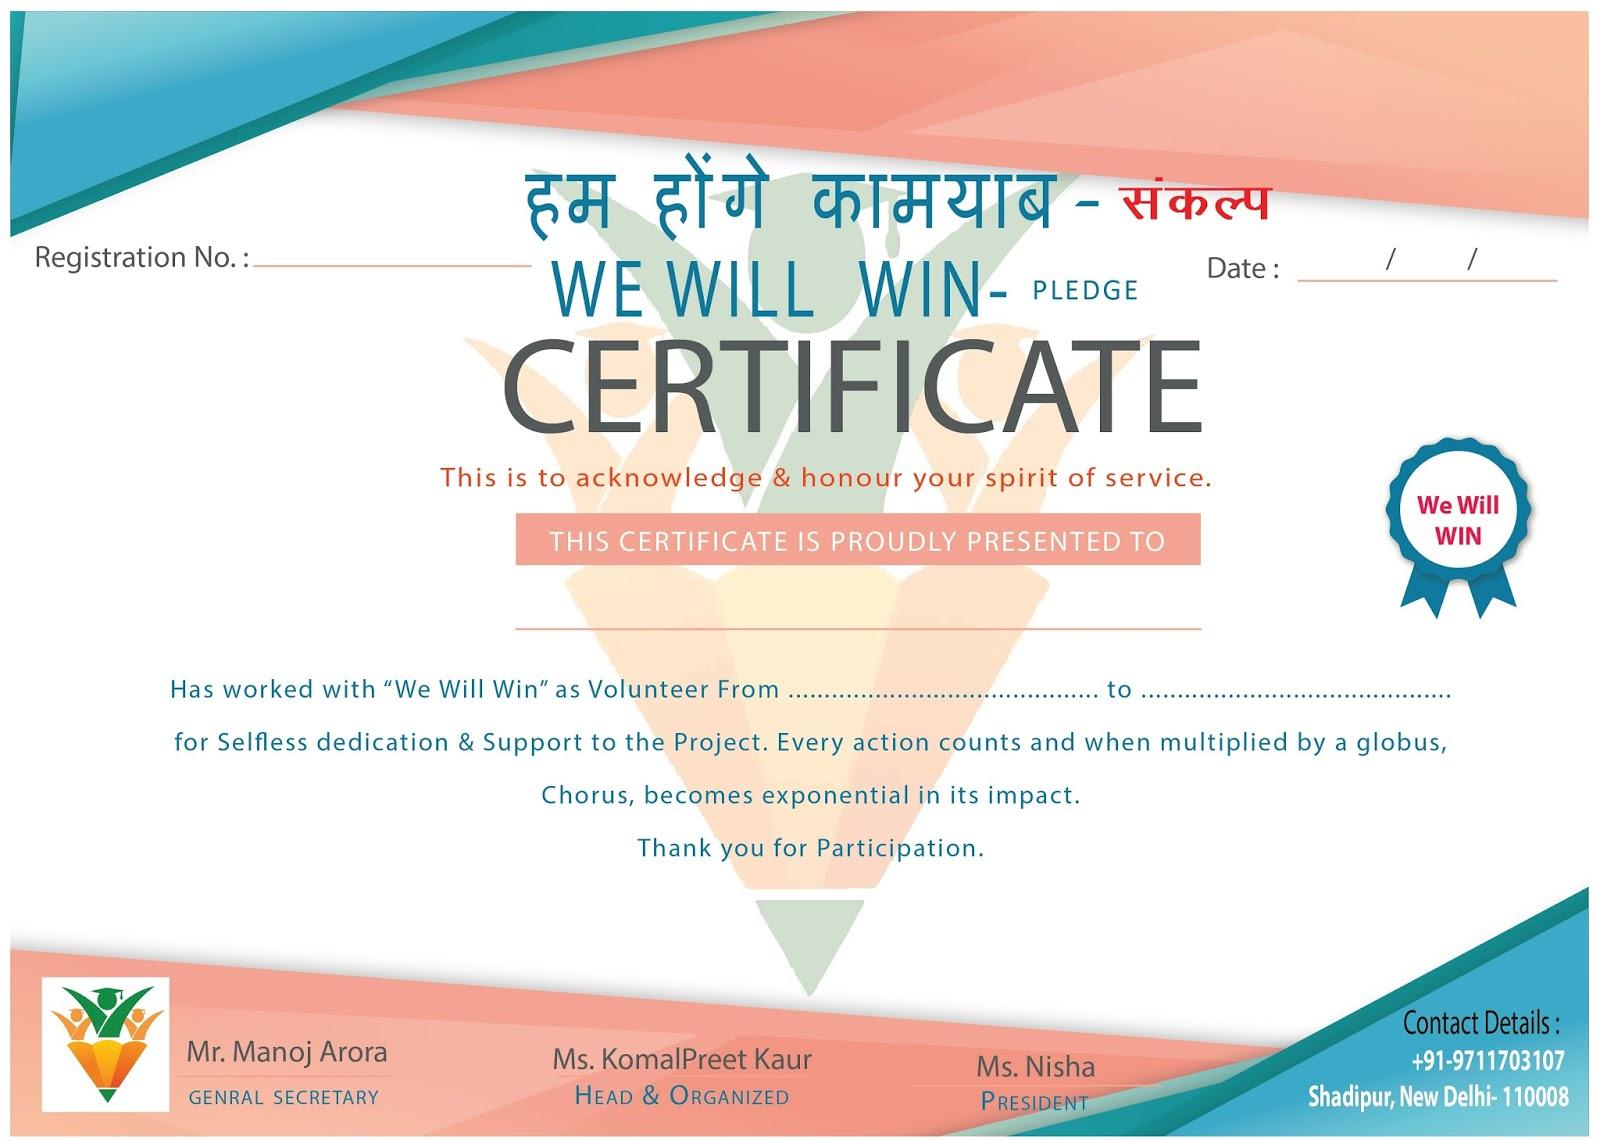 Satish Joshi Graphic Designer Certification Design For We Will